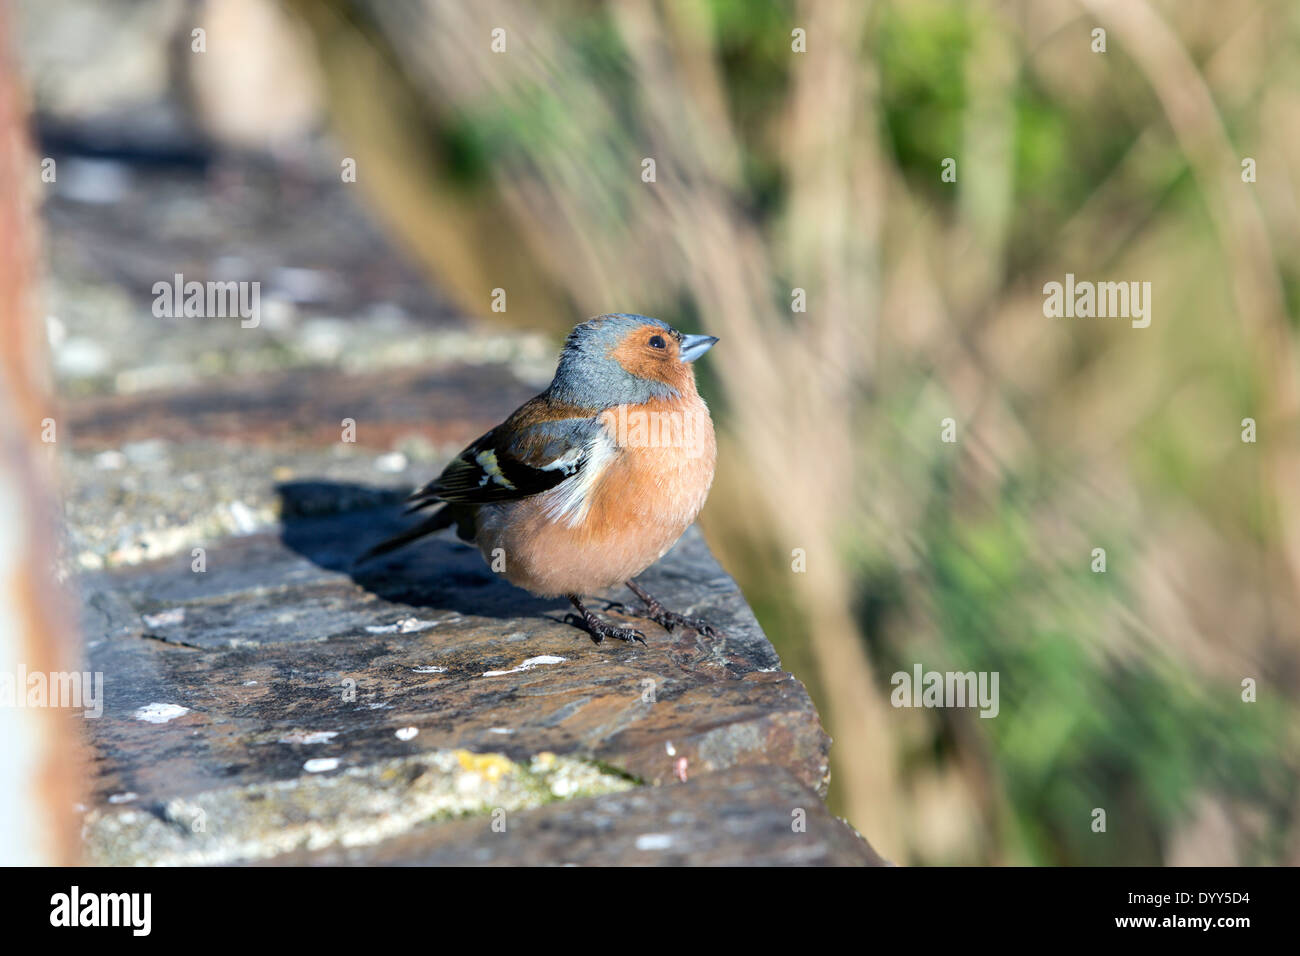 juvenile-common-chaffinch-fringilla-coel